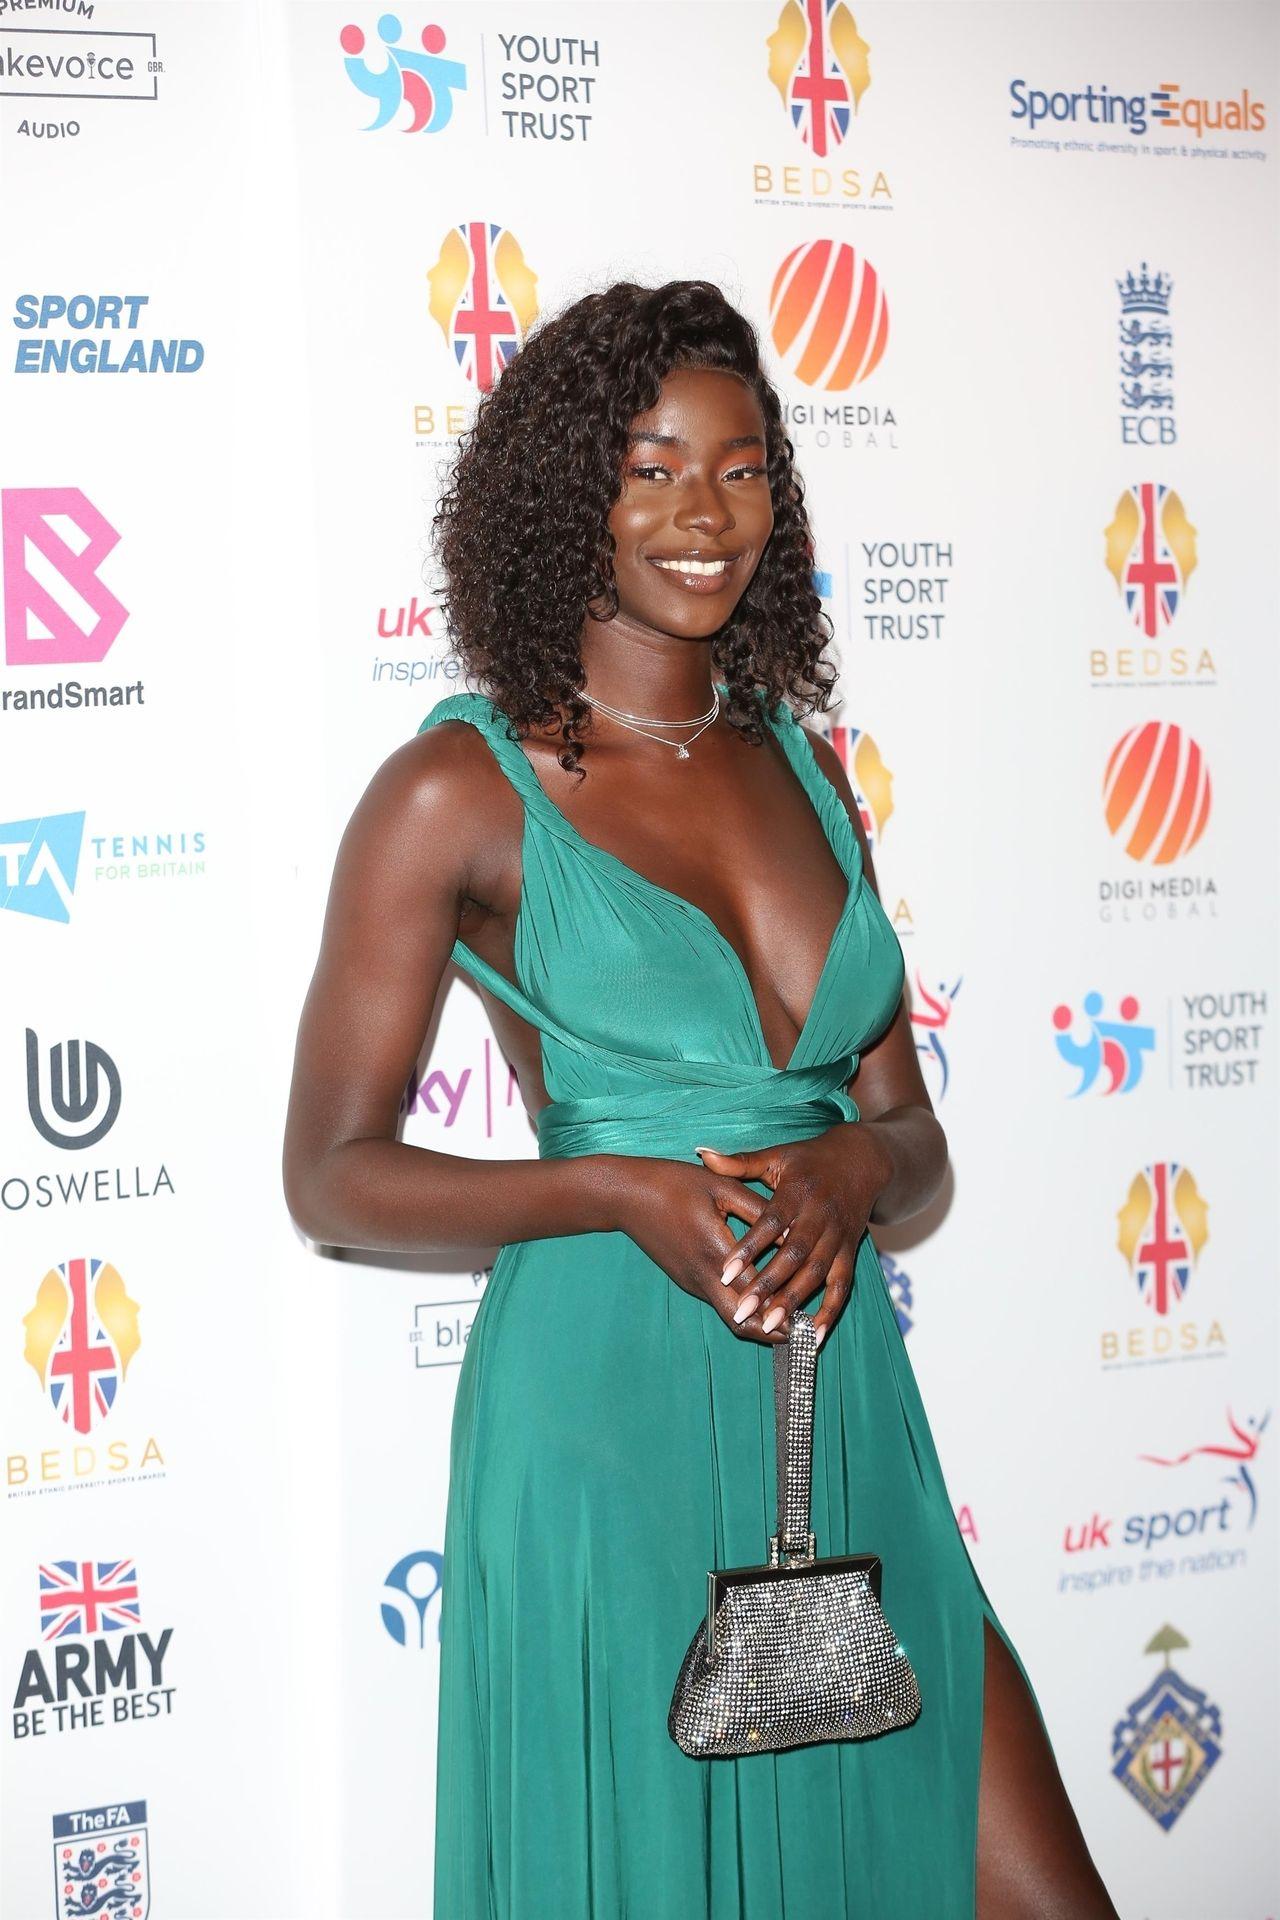 Mike Boateng & Priscilla Anyabu Are Seen At British Ethnic Diversity Sports Awards 0028